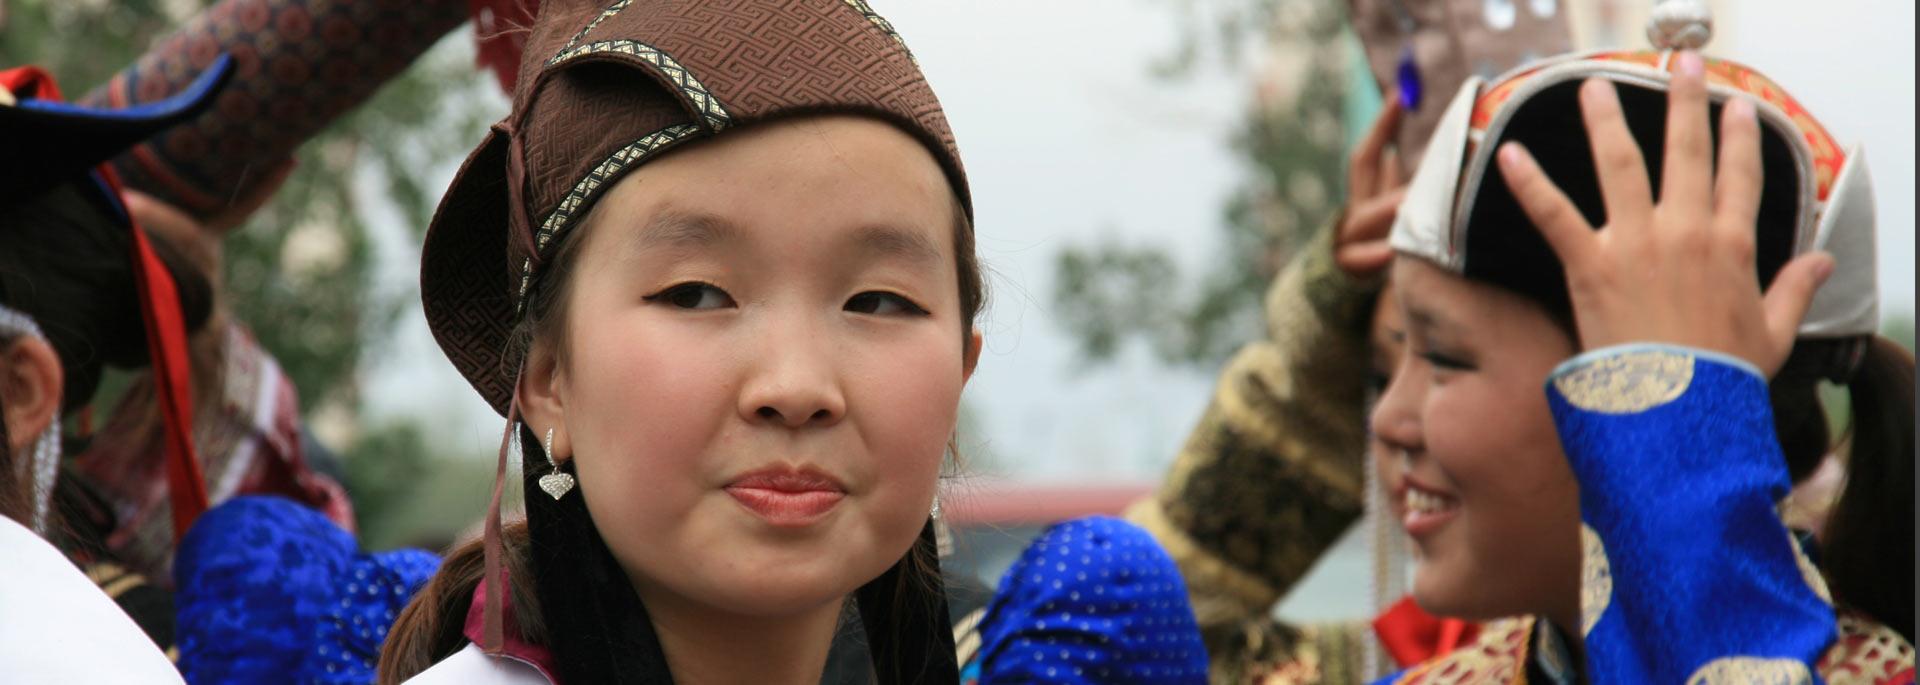 Fotos: Gesichter der Mongolei